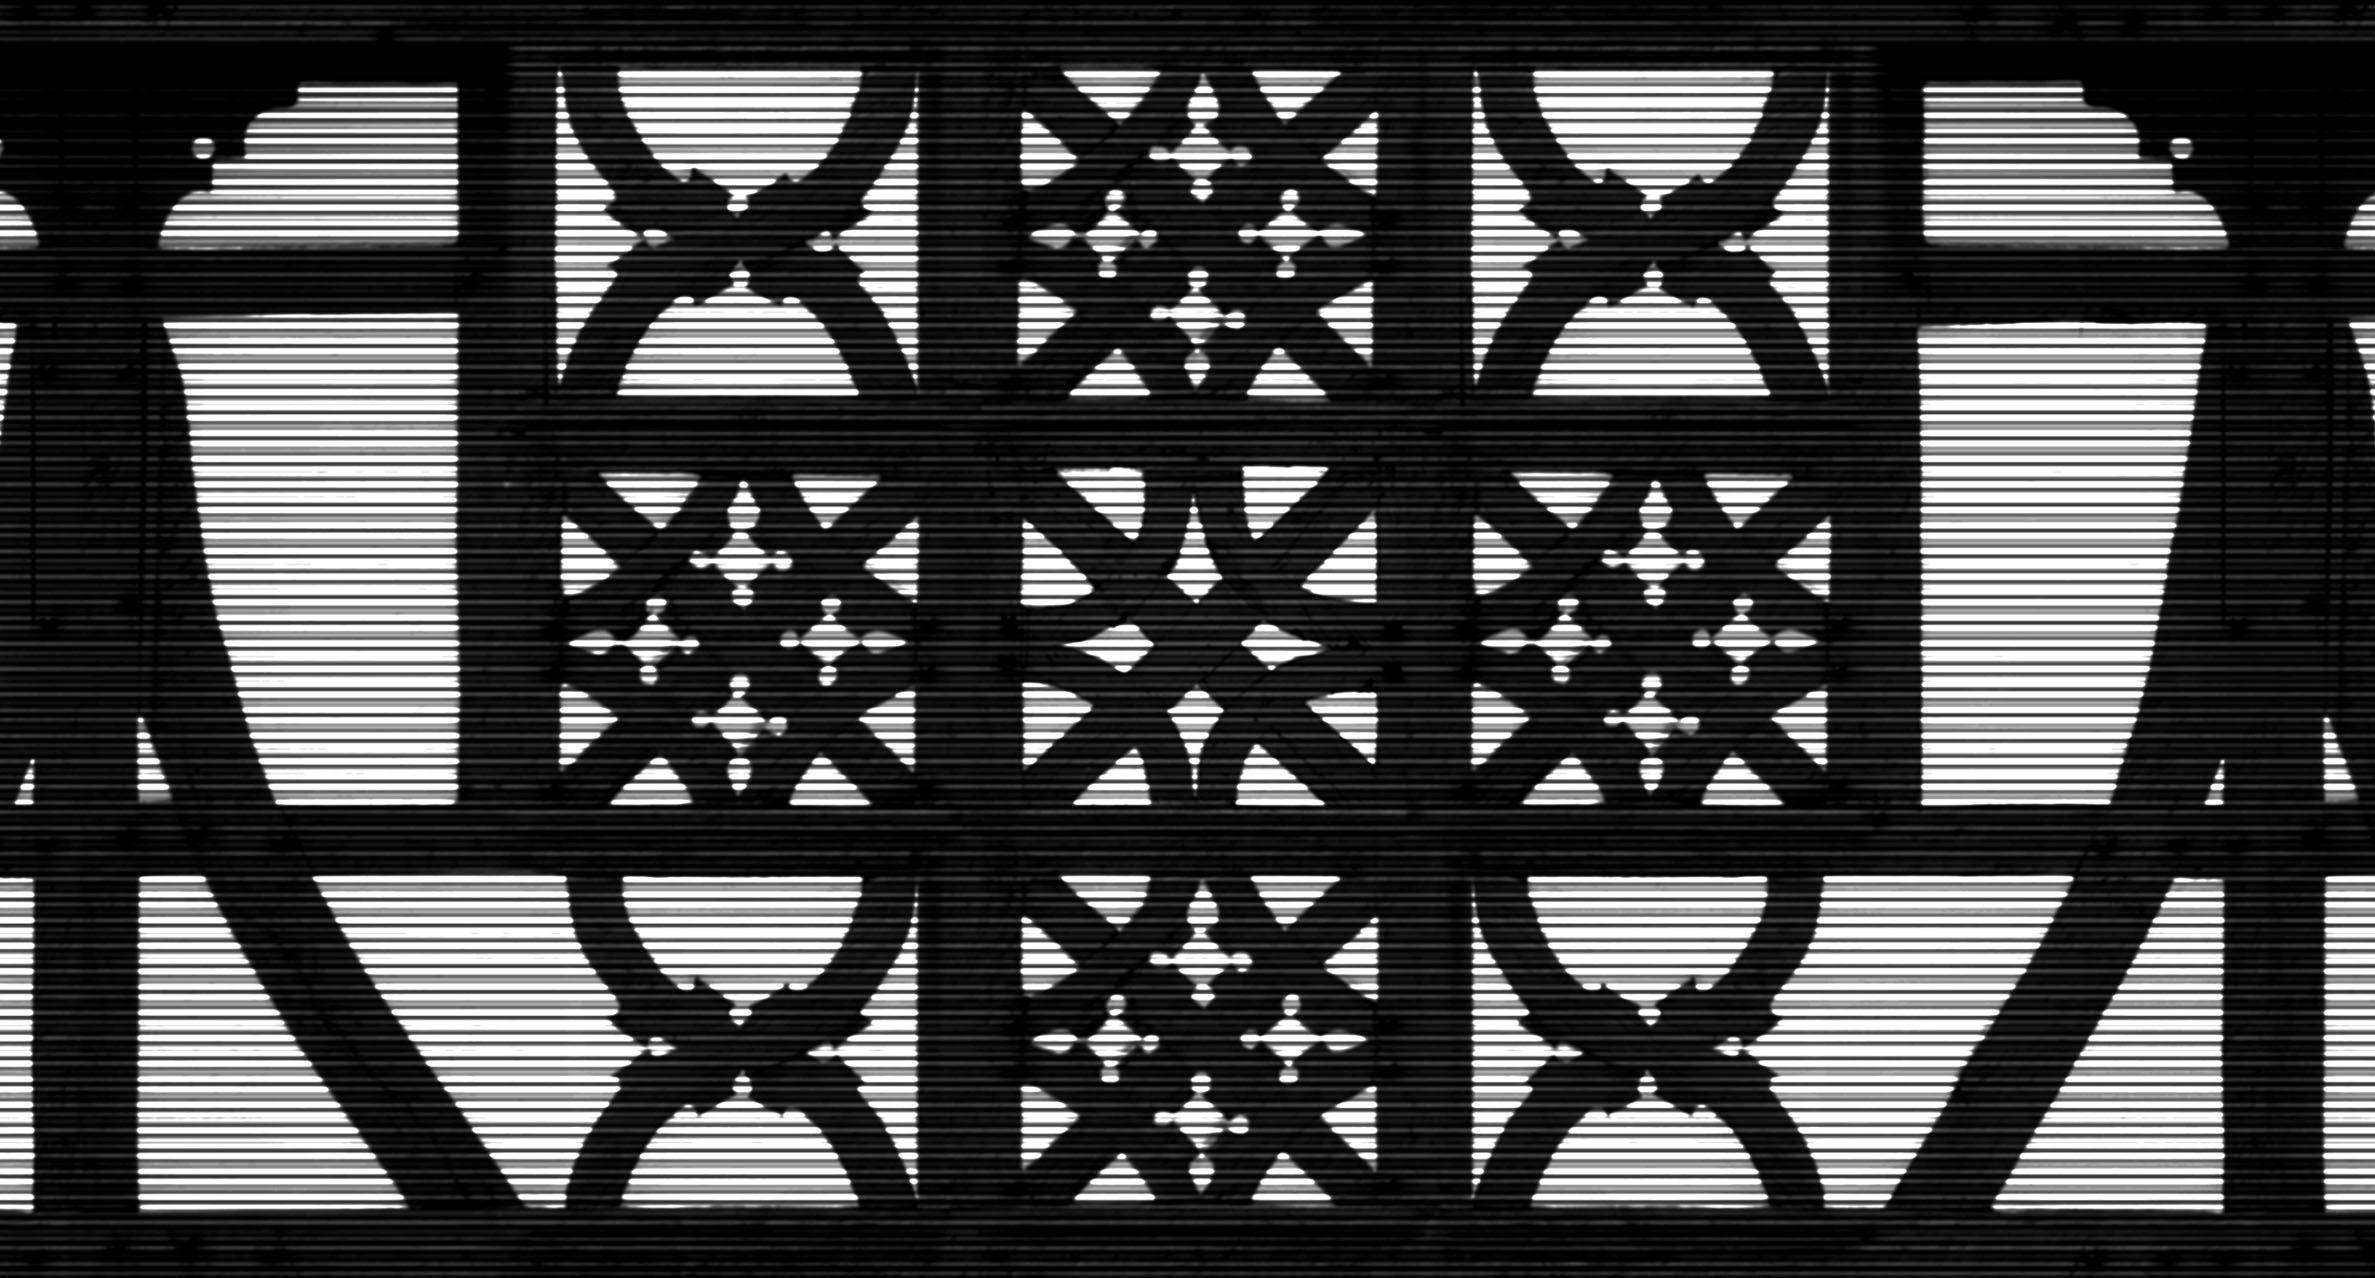 Bettina PousttchiFrameworkSimulation rotunda/detailSimulation Rotunde/DetailCommissioned by Schirn Kunsthalle Frankfurt© Courtesy Bettina Pousttchi/Buchmann Galerie Berlin© Foto: Bettina Pousttchi